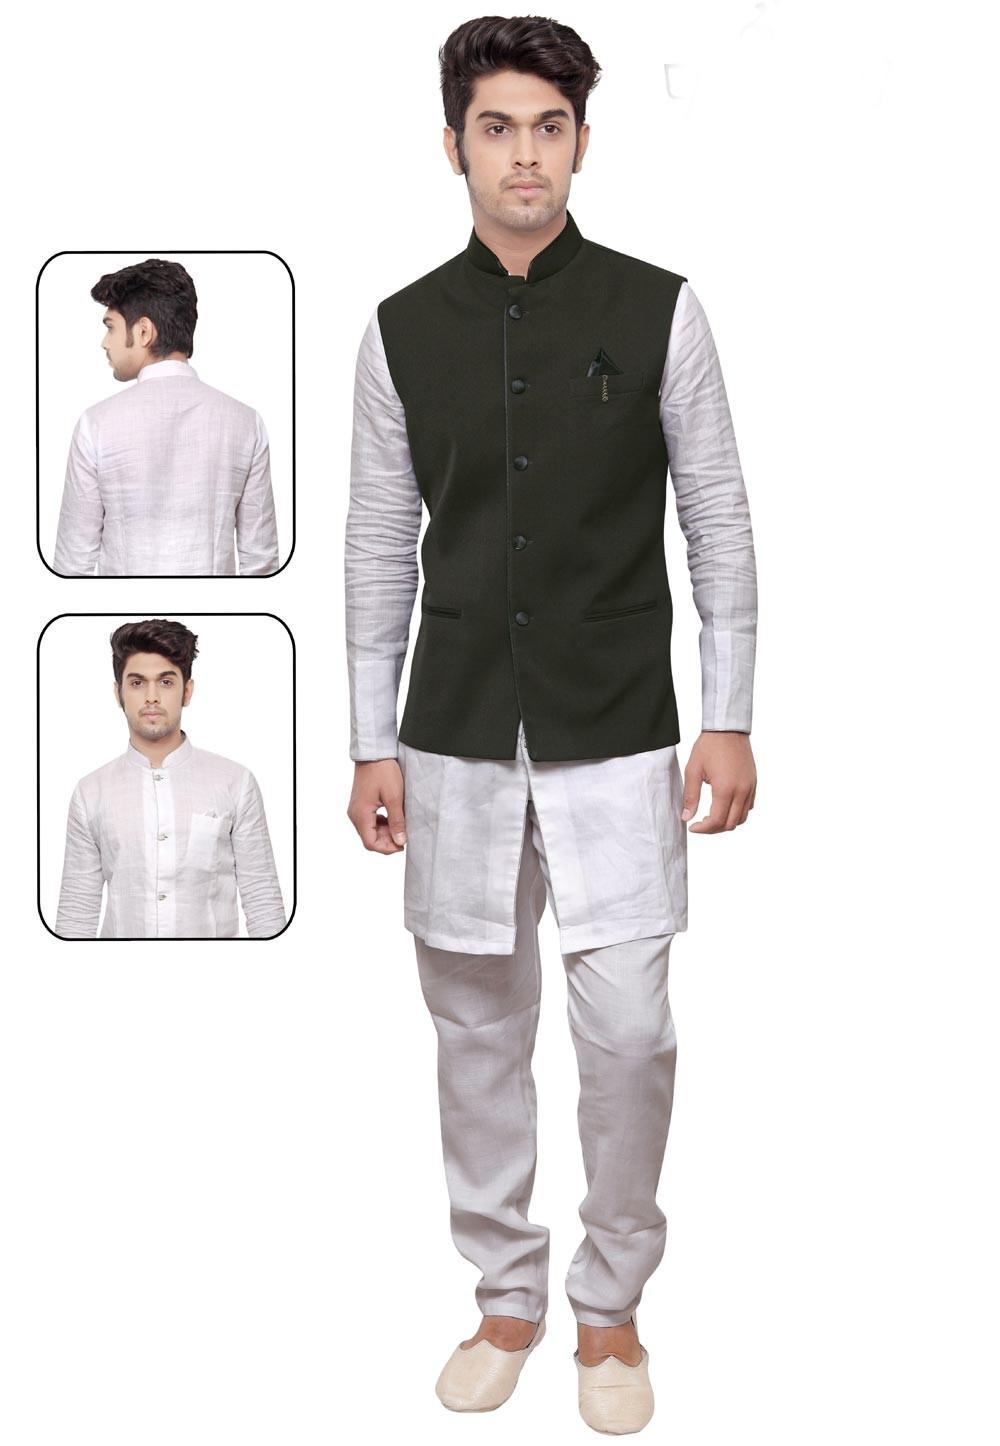 White,Green Color Linen,Cotton Kurta Pajama With Jacket.